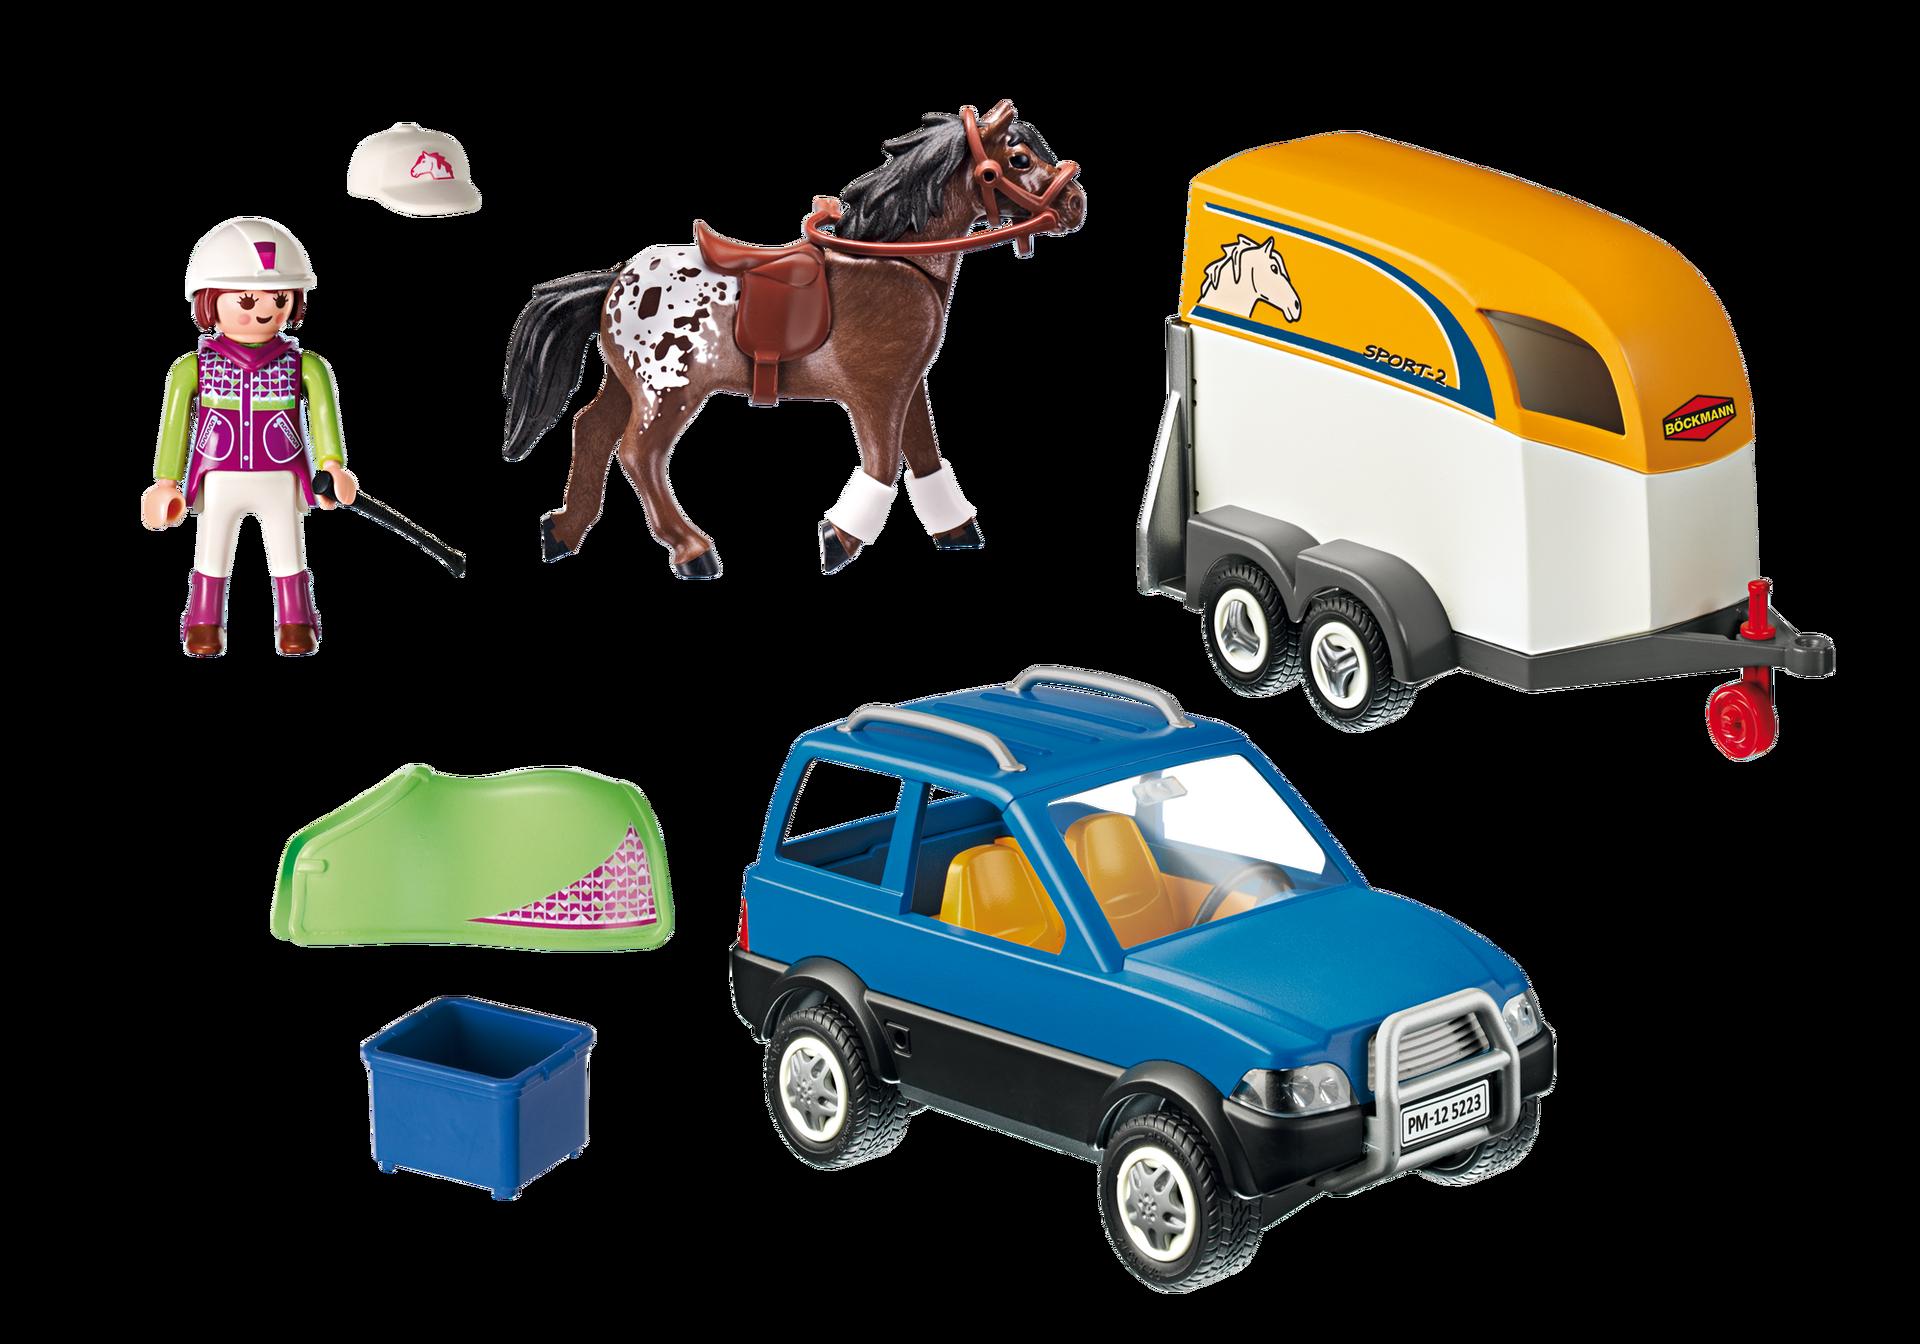 voiture avec remorque et cheval 5223 playmobil france. Black Bedroom Furniture Sets. Home Design Ideas